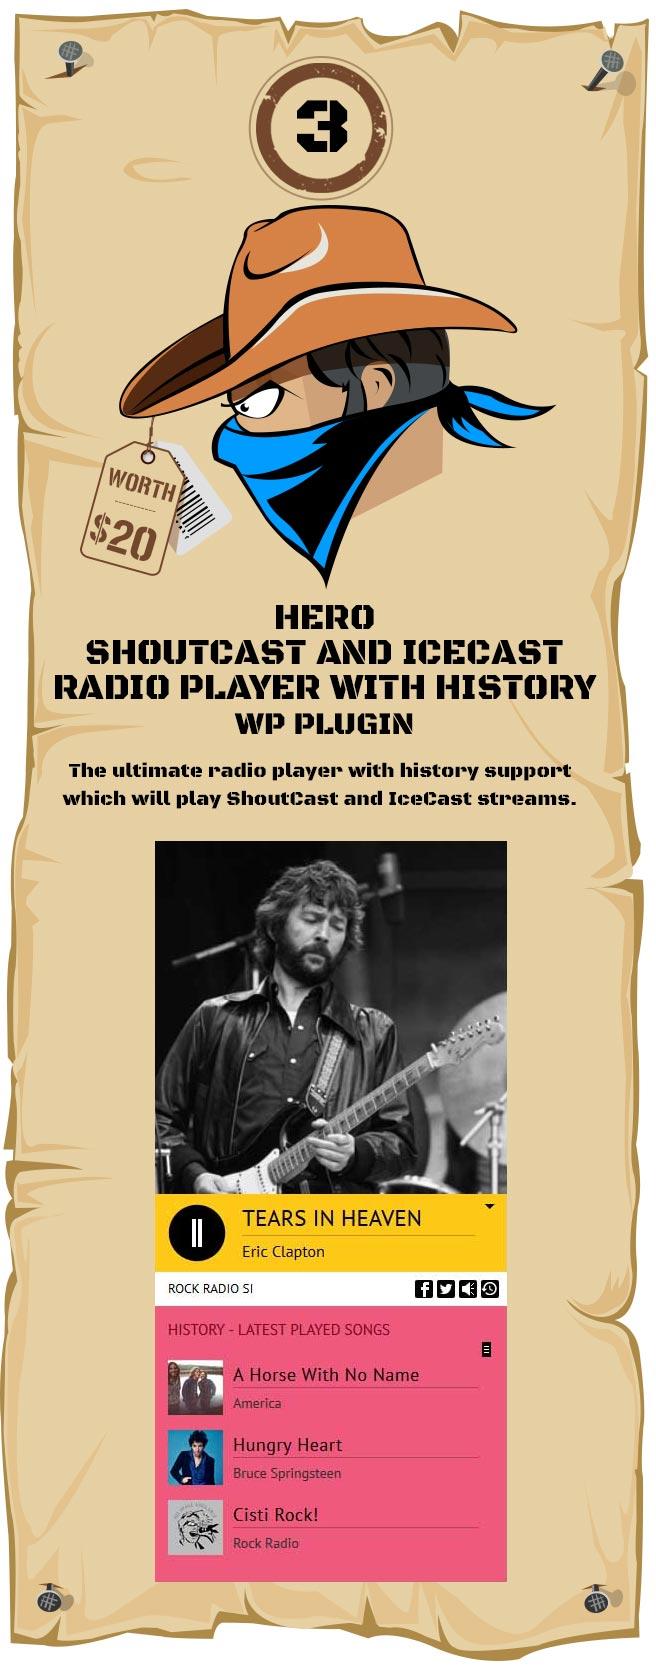 Hero - Shoutcast and Icecast Radio Player With History - WordPress Plugin